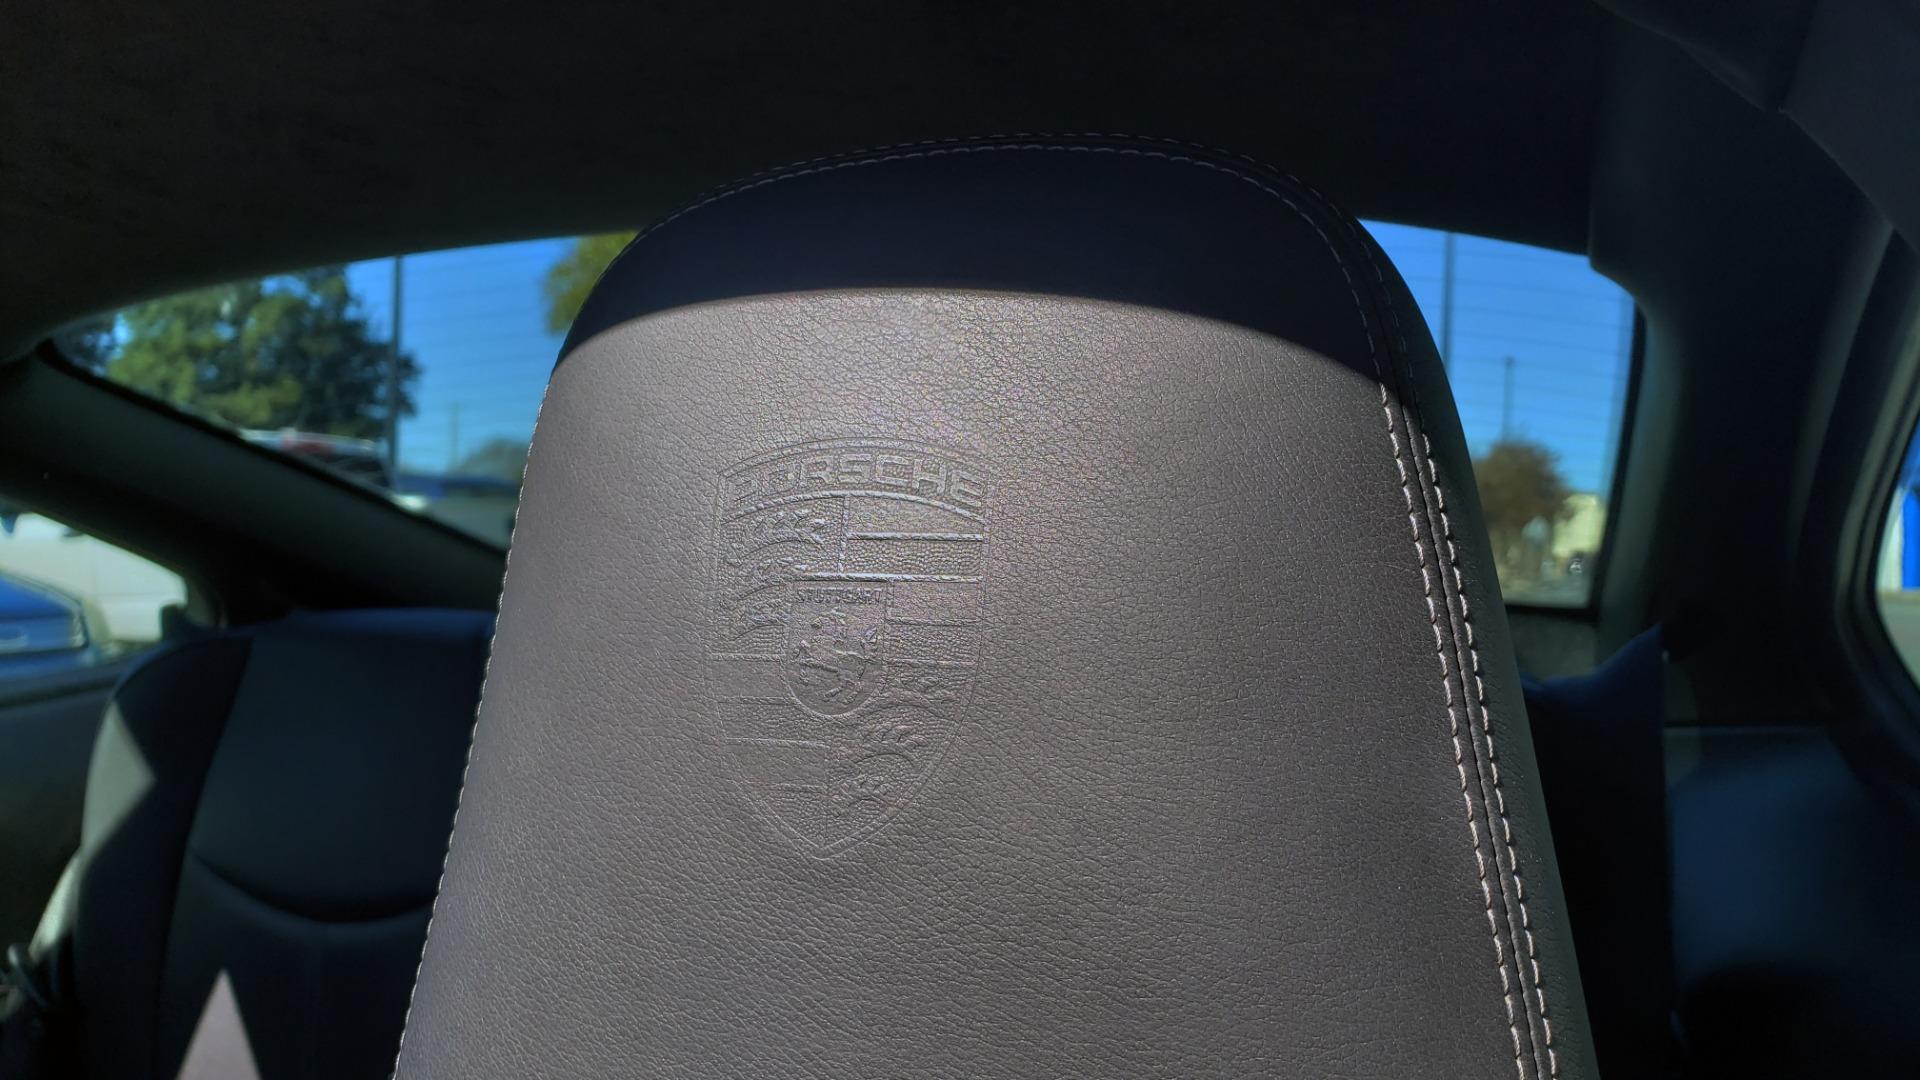 Used 2006 Porsche 911 CARRERA S / 5-SPD AUTO / SPORT CHRONO / NAV / BOSE / SUNROOF for sale Sold at Formula Imports in Charlotte NC 28227 19